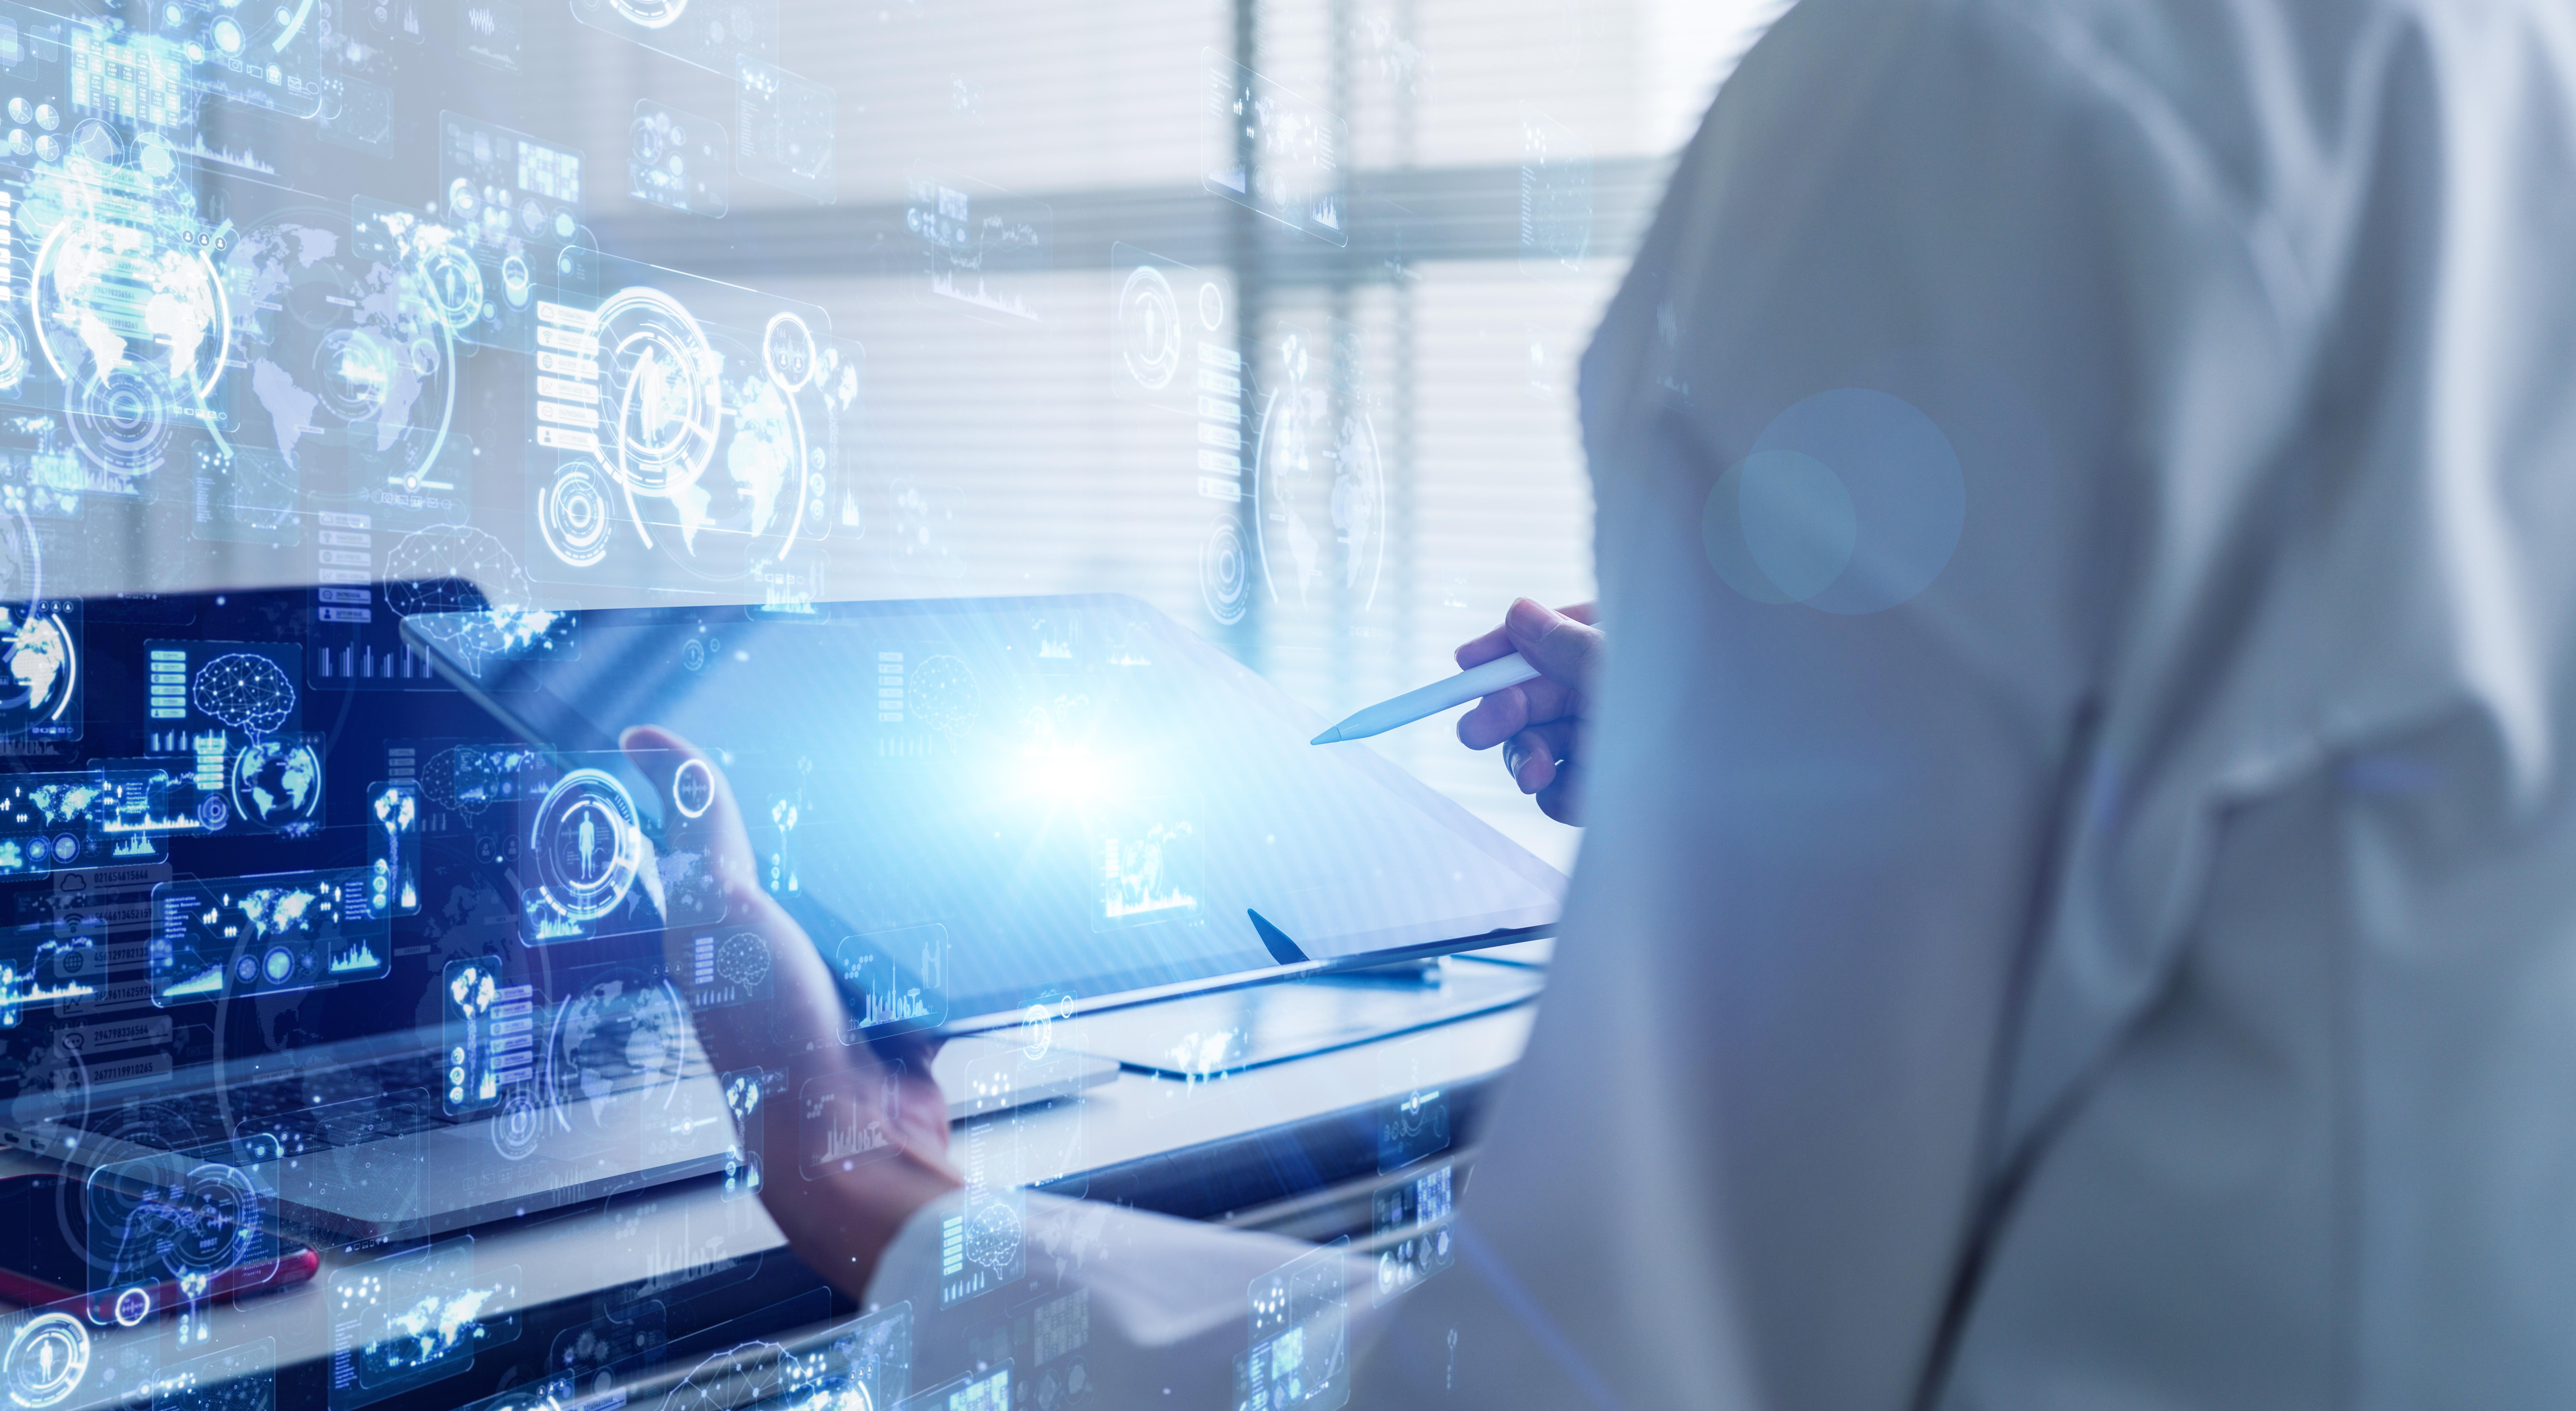 Torne a sua clínica online com a Telemedicina Morsch